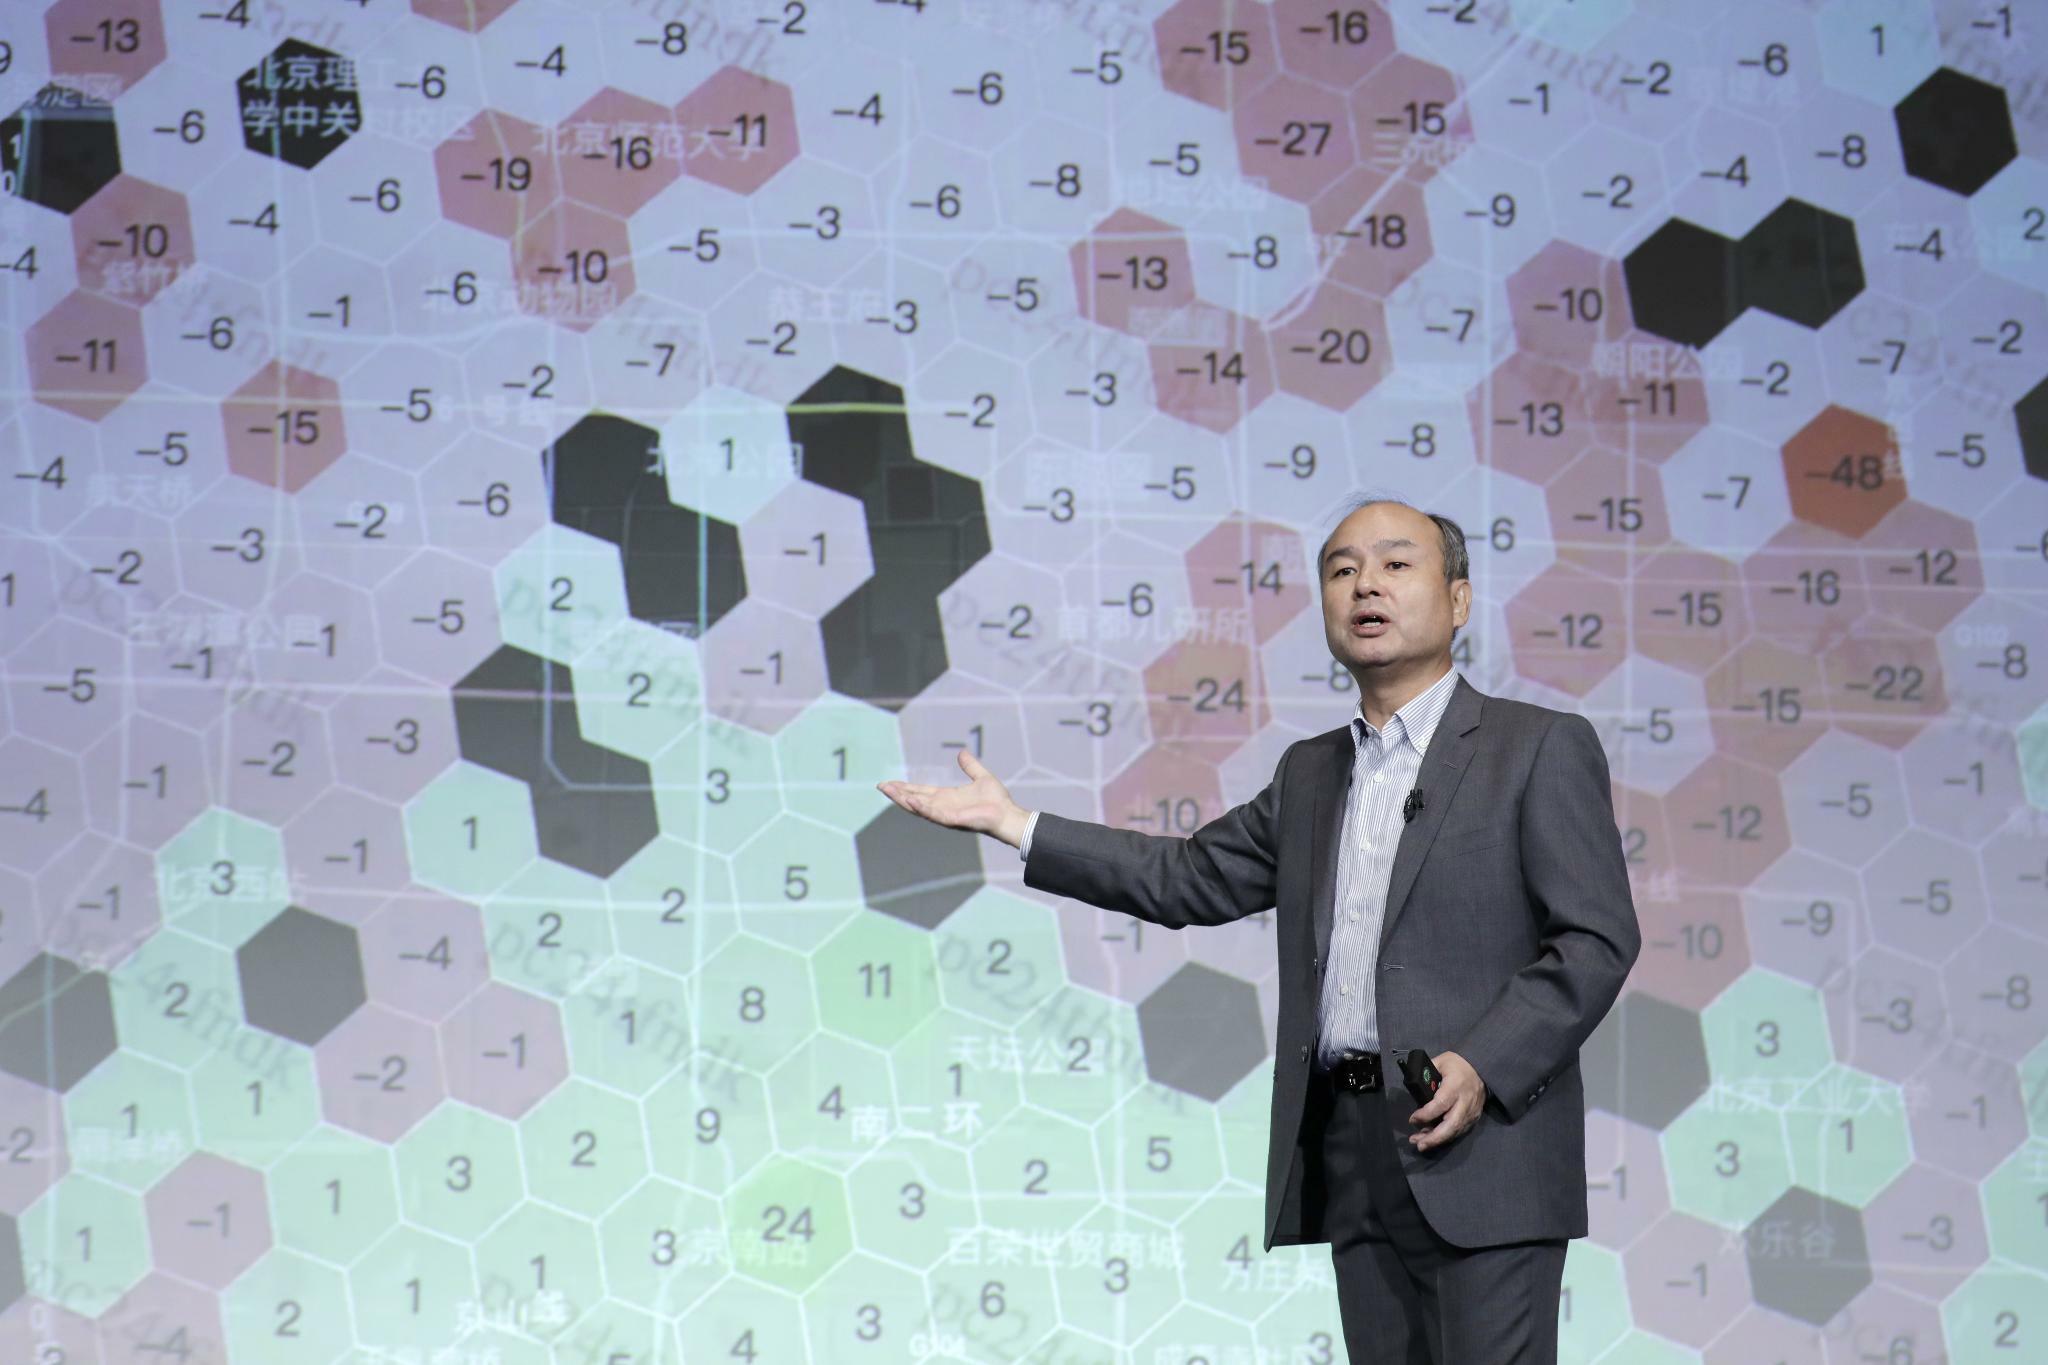 Softbank: Verschobener WeWork-Börsengang belastet Großinvestor